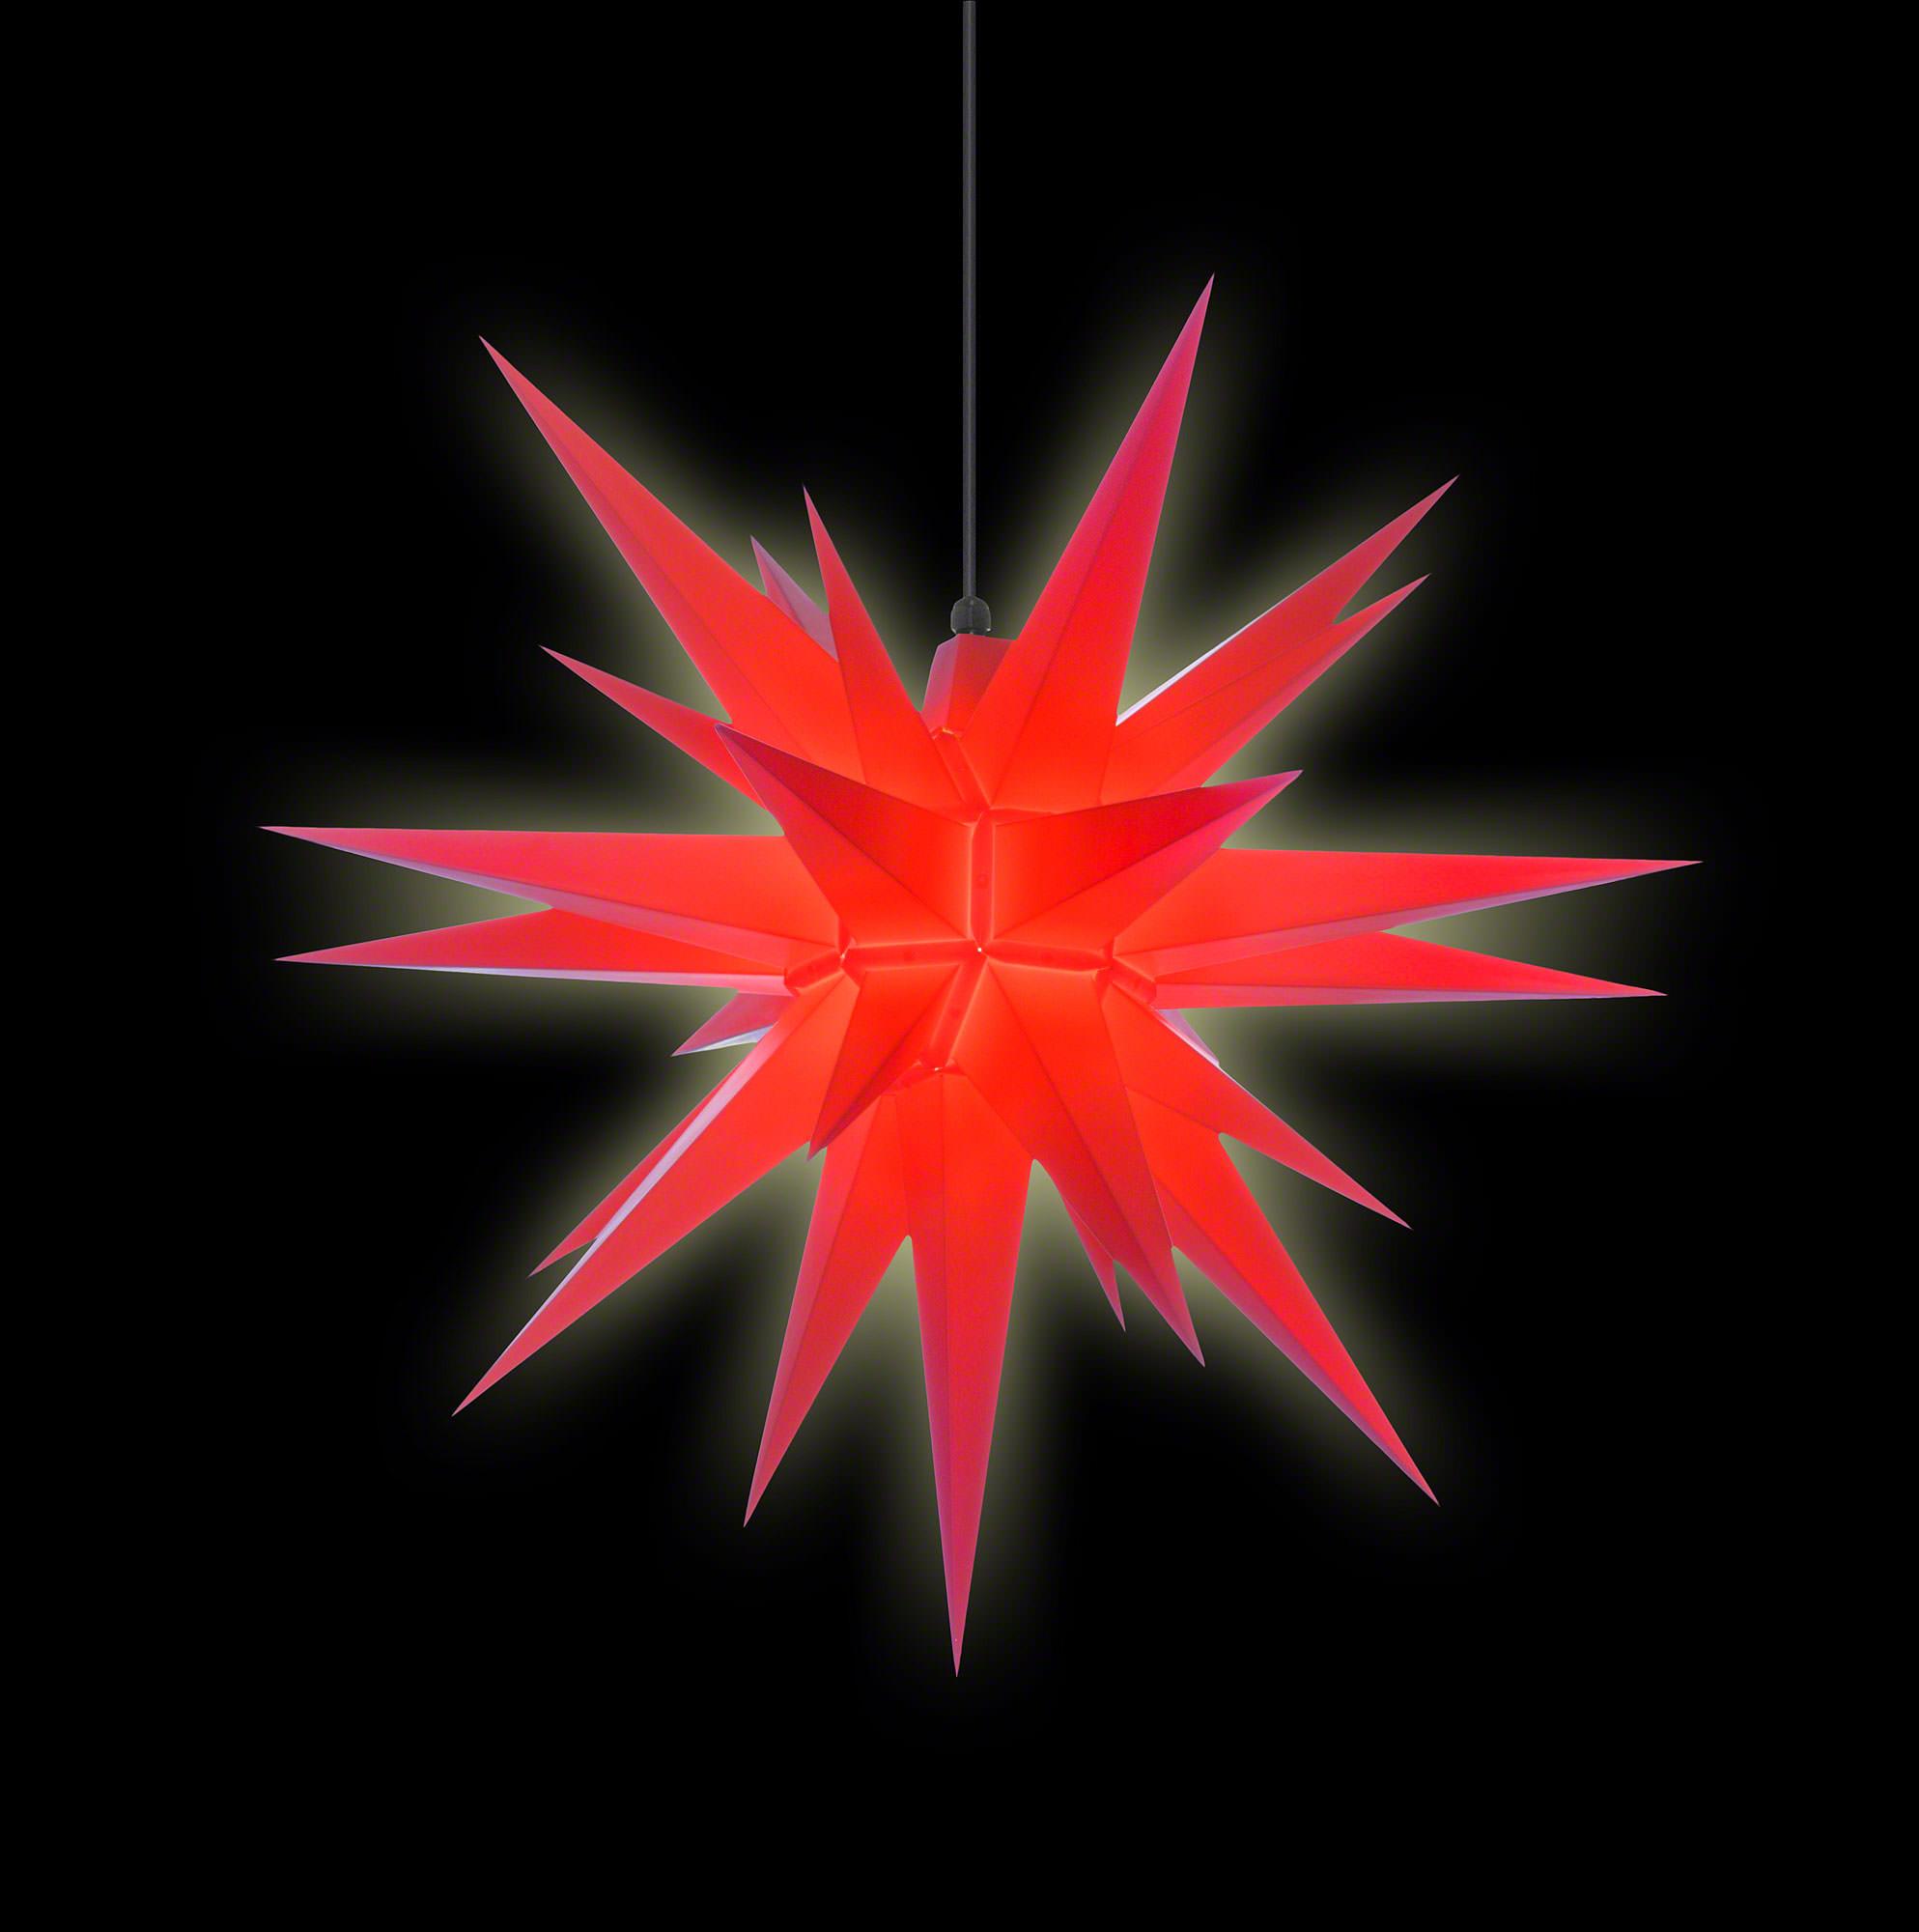 herrnhuter moravian star a7 red plastic 68cm 27in by herrnhuter sterne. Black Bedroom Furniture Sets. Home Design Ideas